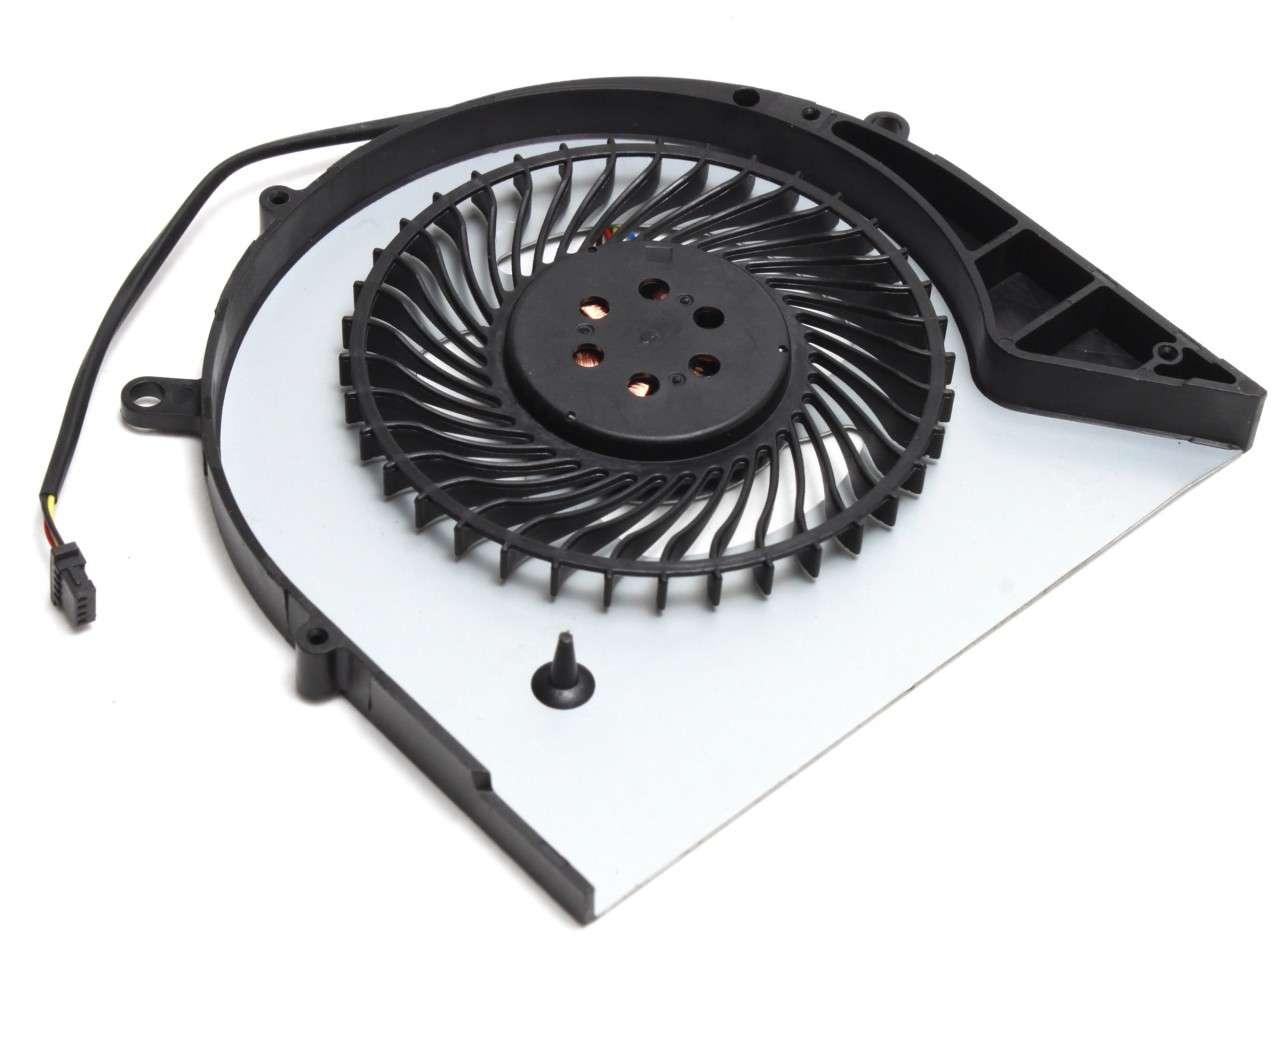 Cooler placa video laptop GPU Asus FX63VM7300 imagine powerlaptop.ro 2021